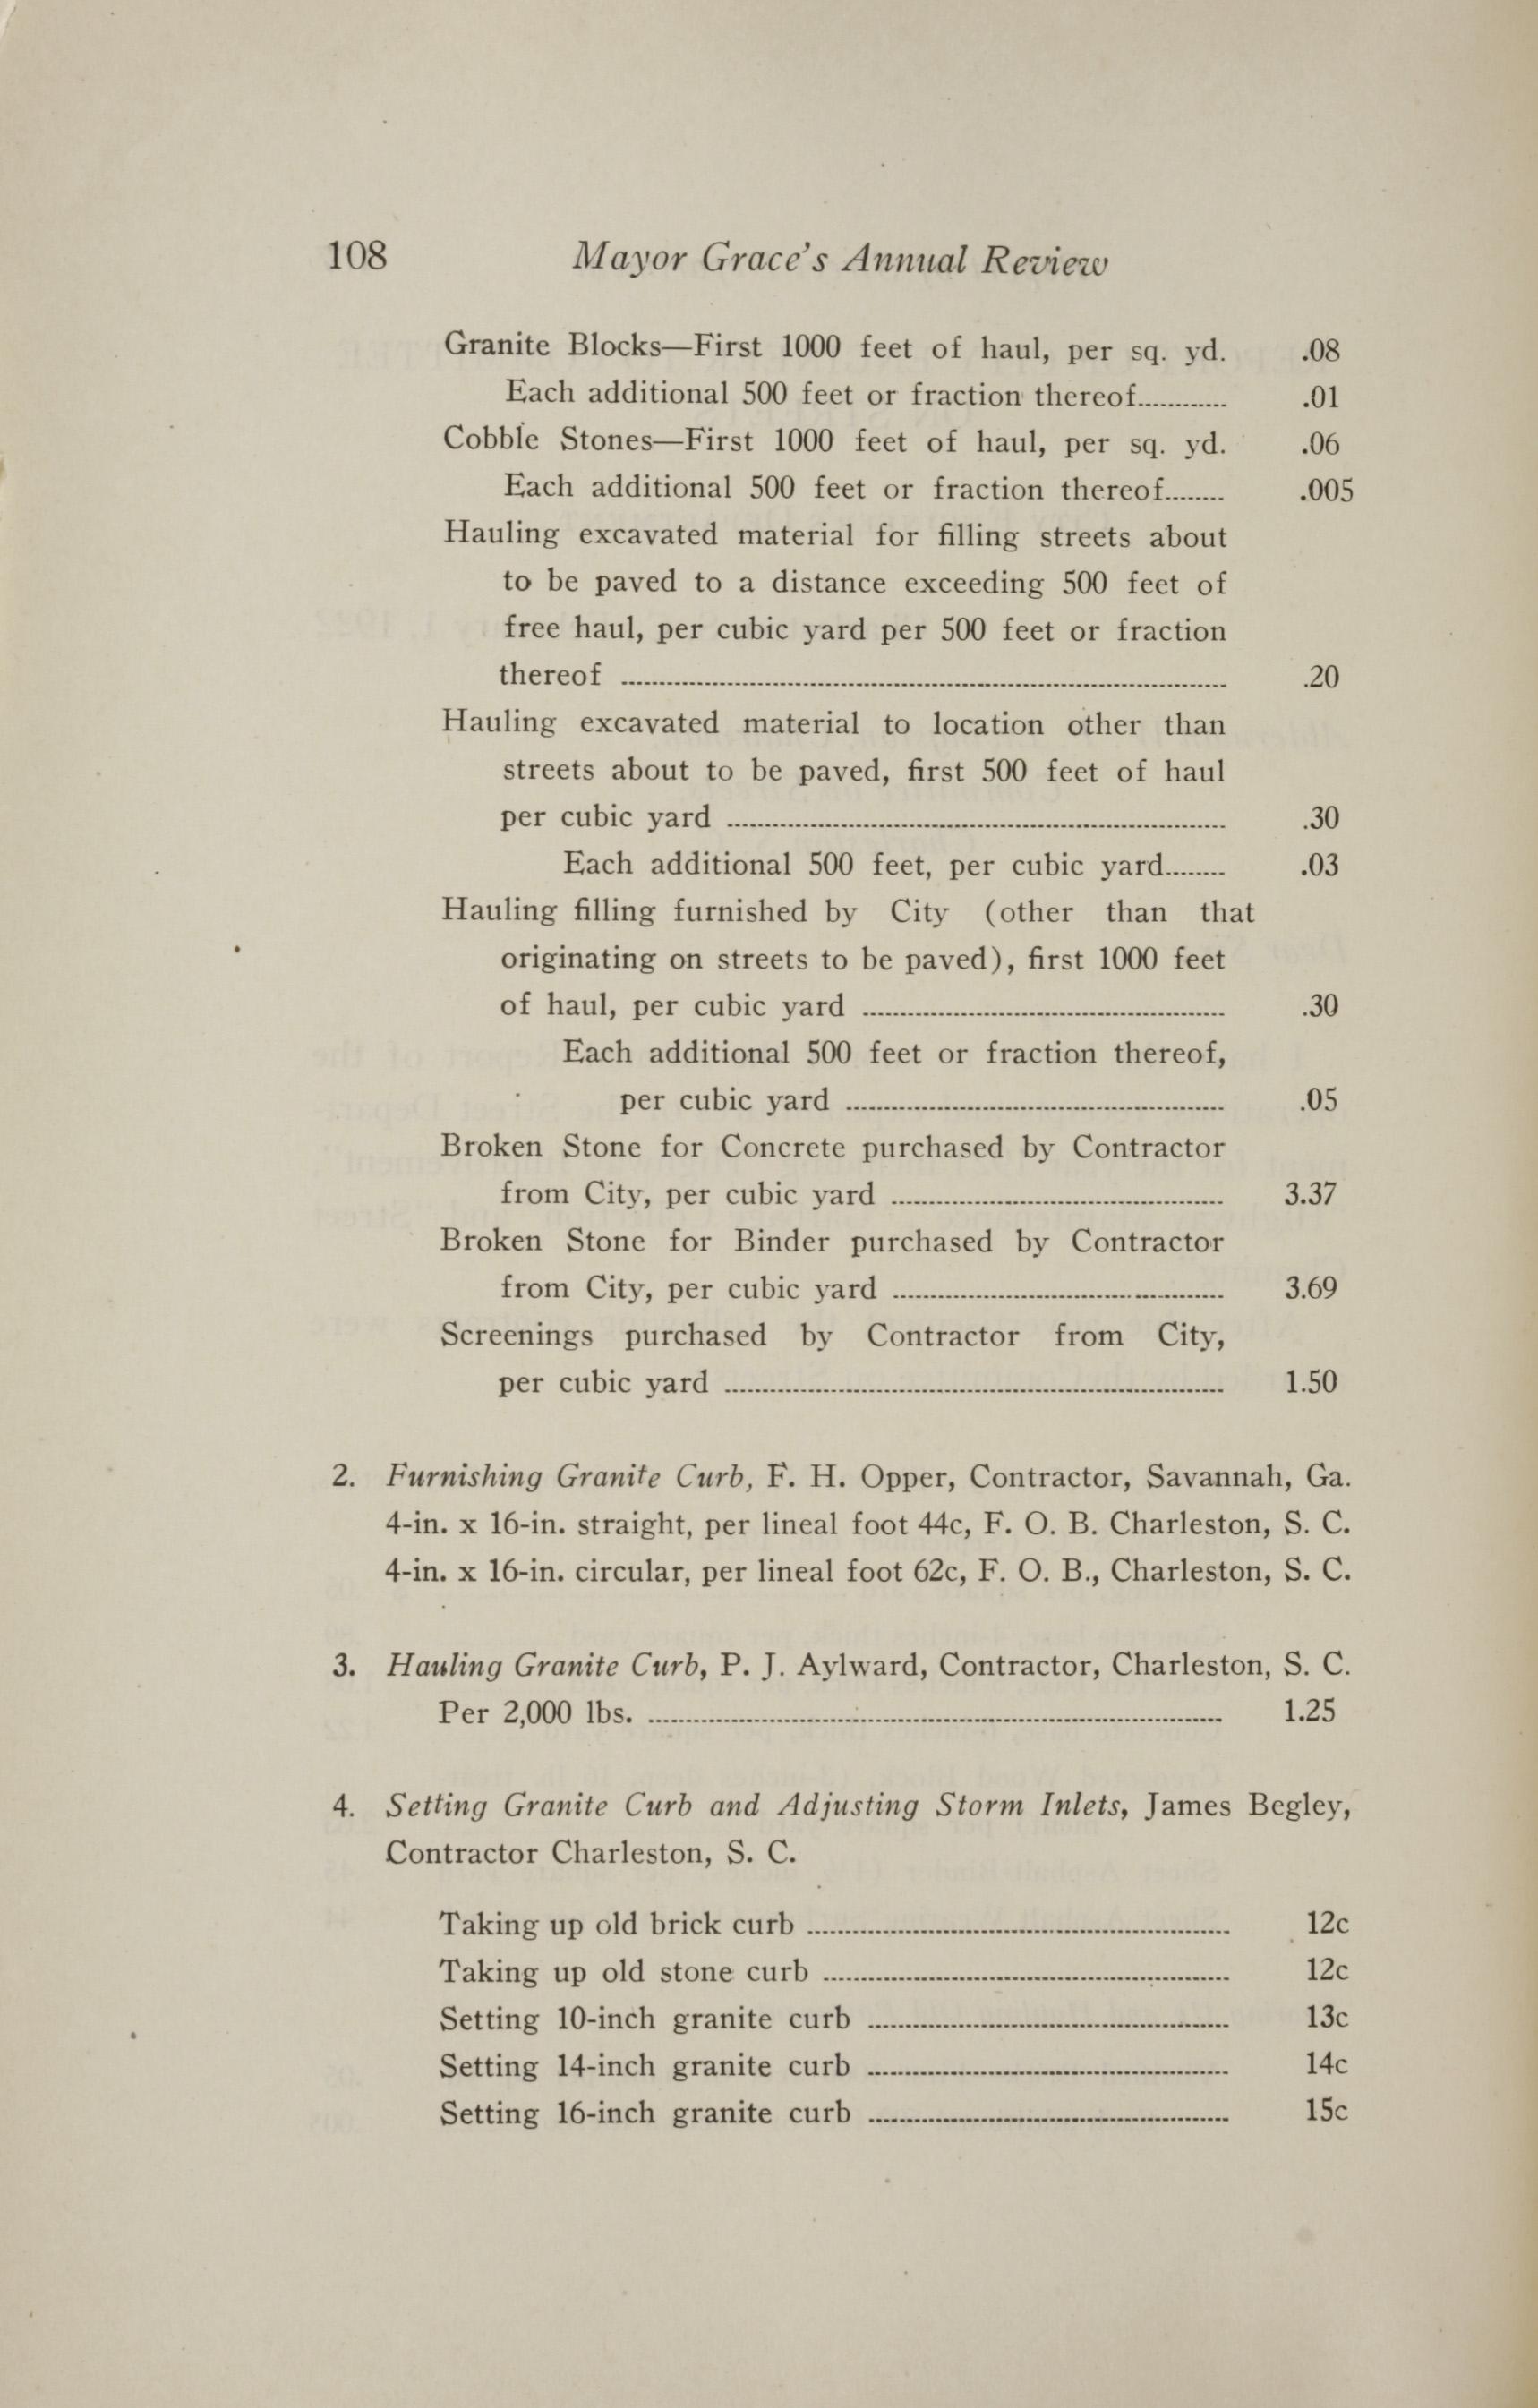 Charleston Yearbook, 1921, page 108